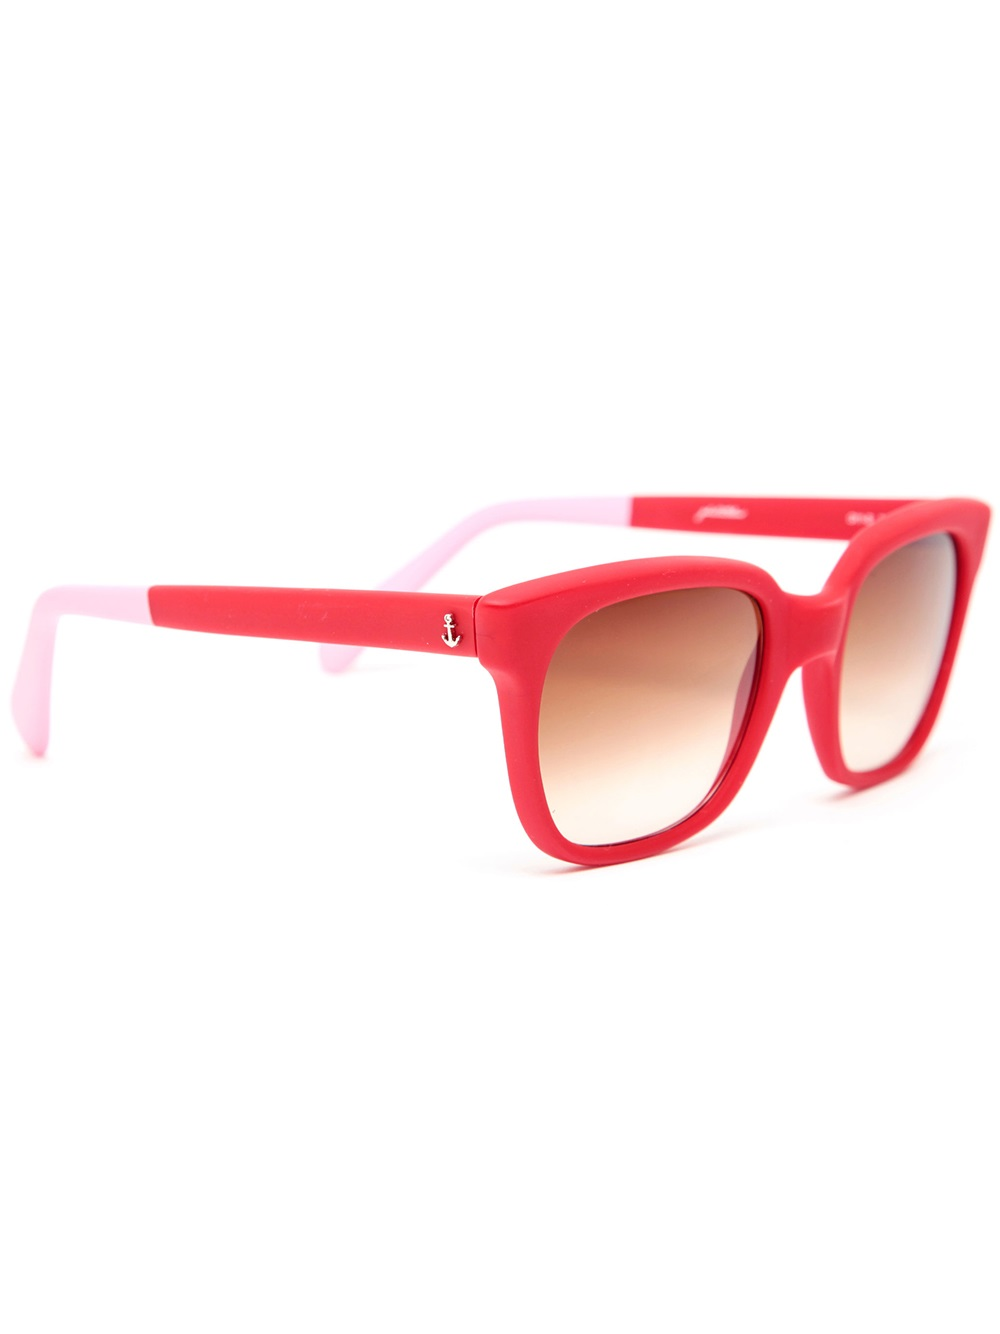 Sheriff & Cherry G11s Futura Red Matte Sunglasses